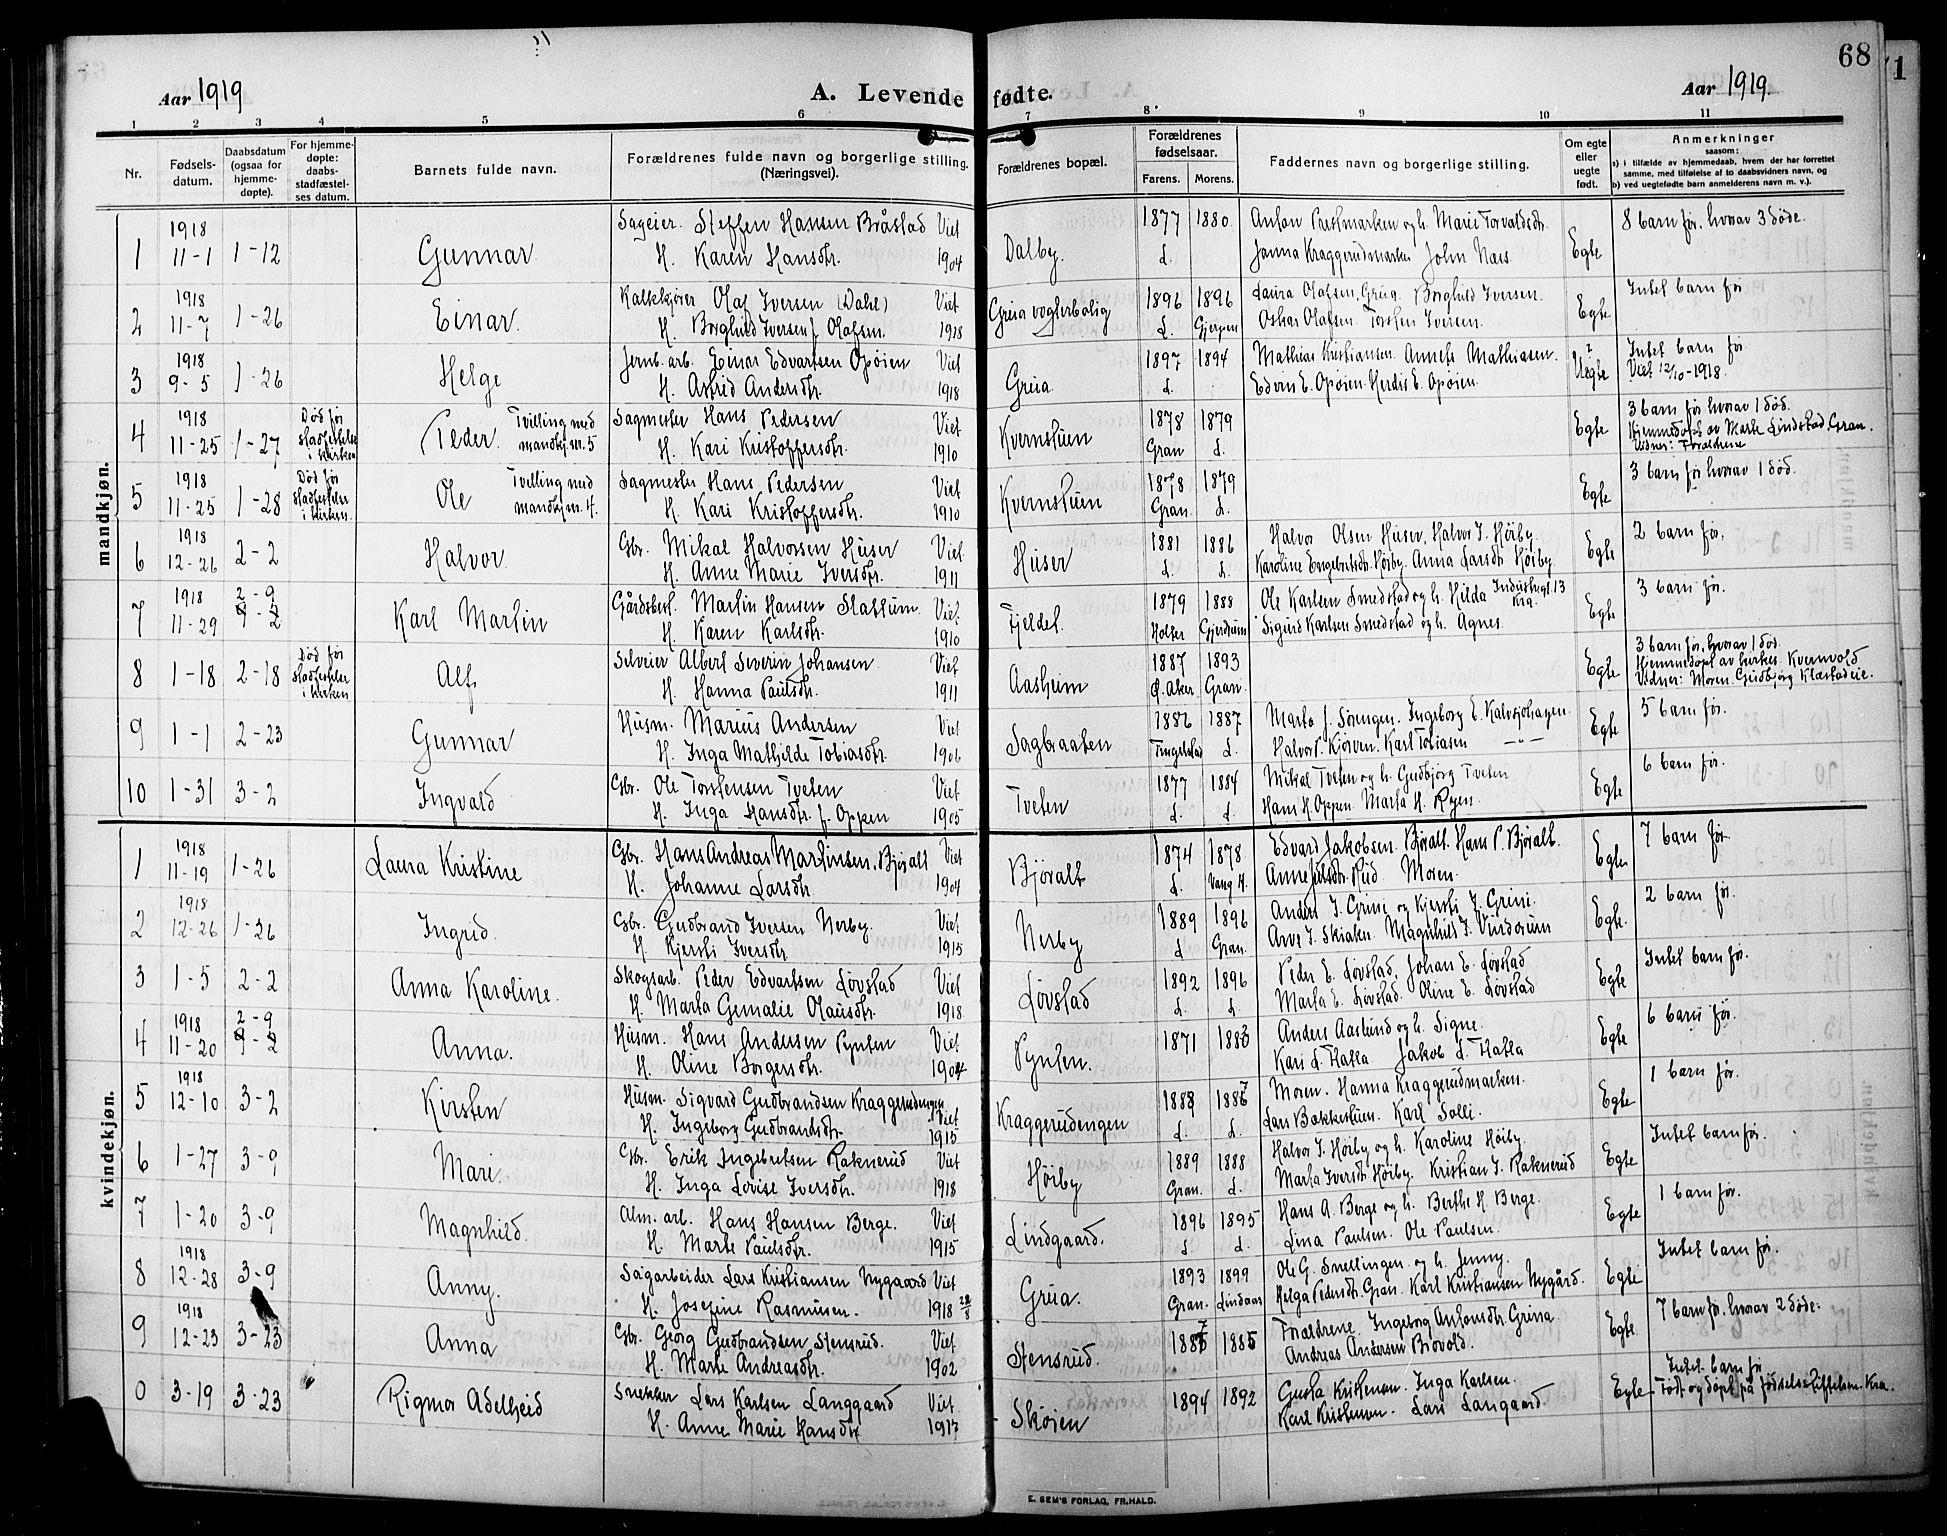 SAH, Lunner prestekontor, H/Ha/Hab/L0001: Klokkerbok nr. 1, 1909-1922, s. 68